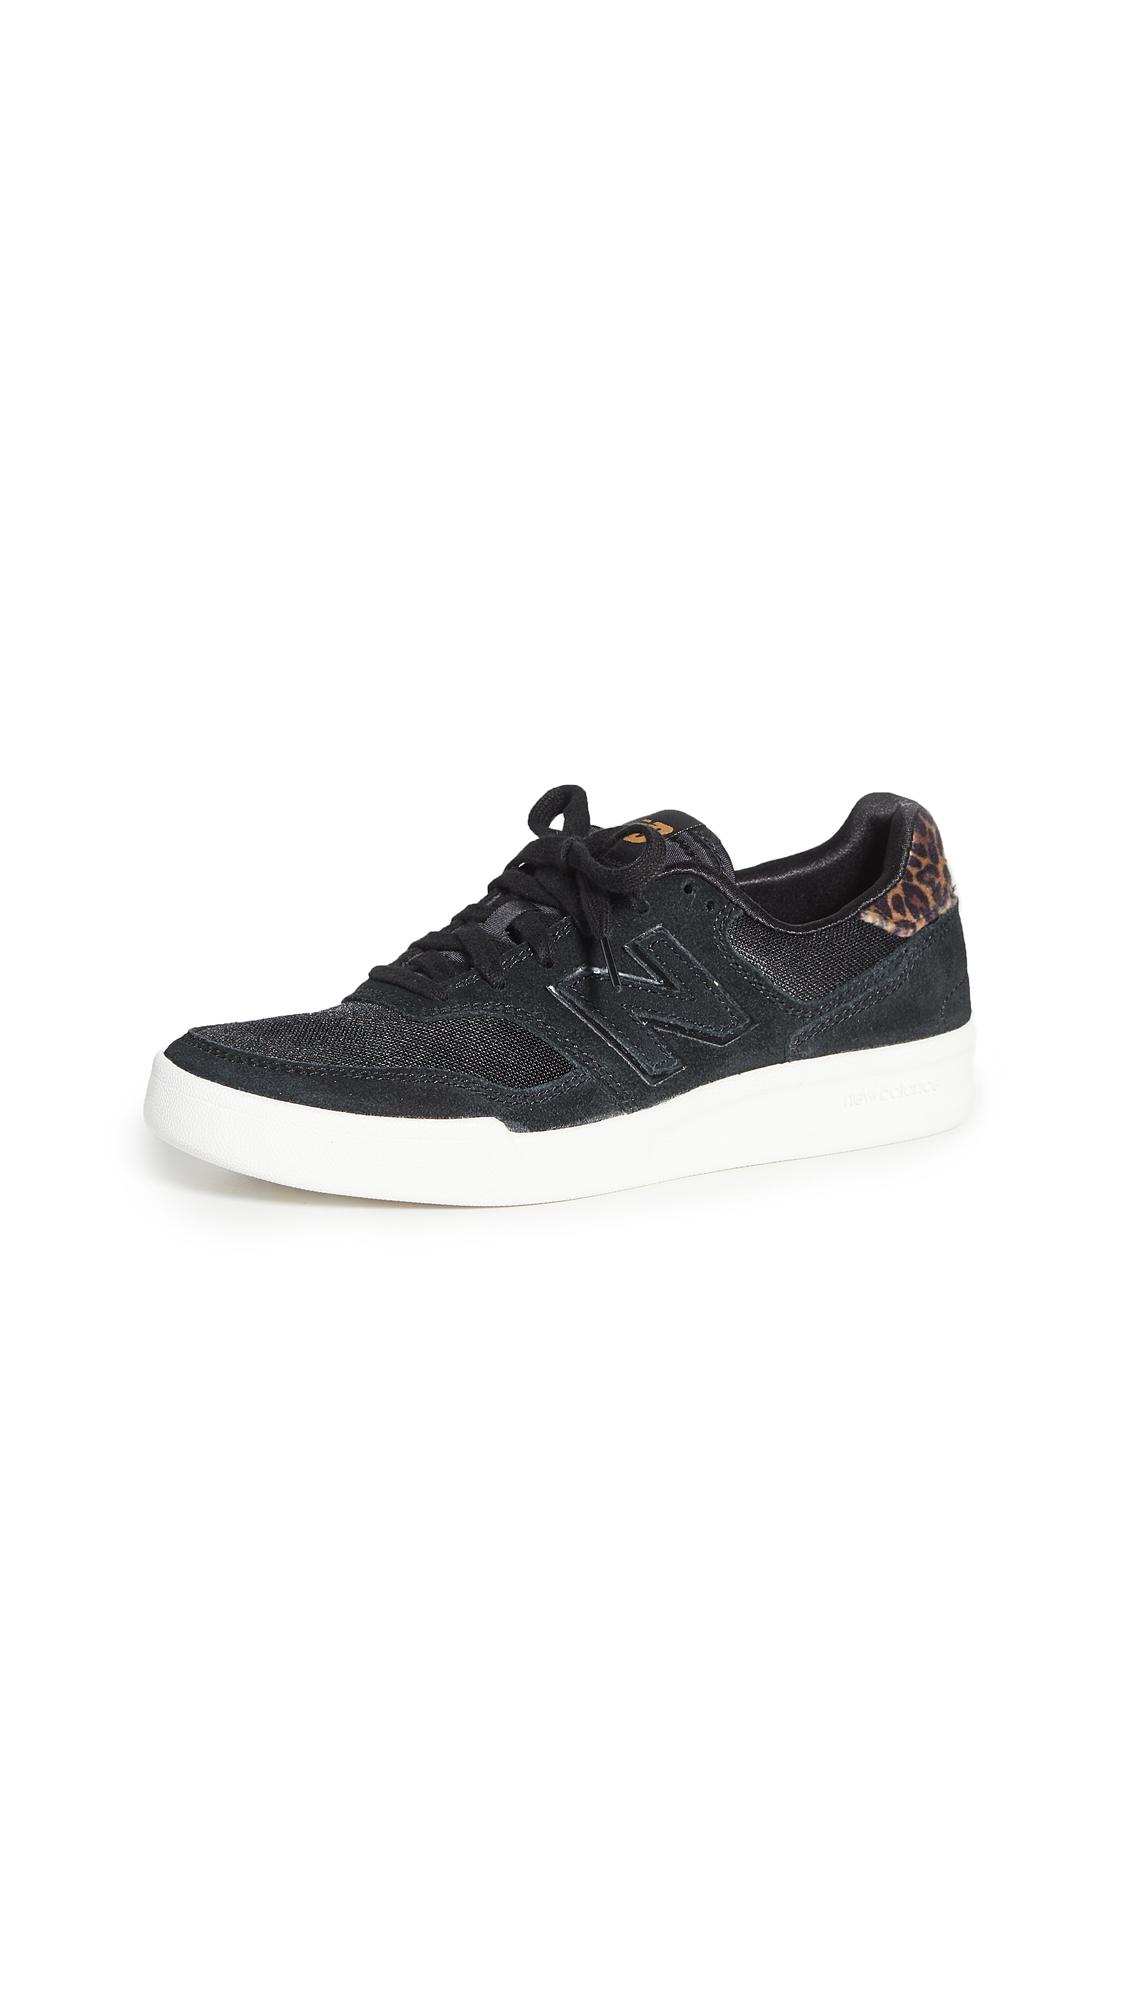 New Balance Black Lace Up Sneaker